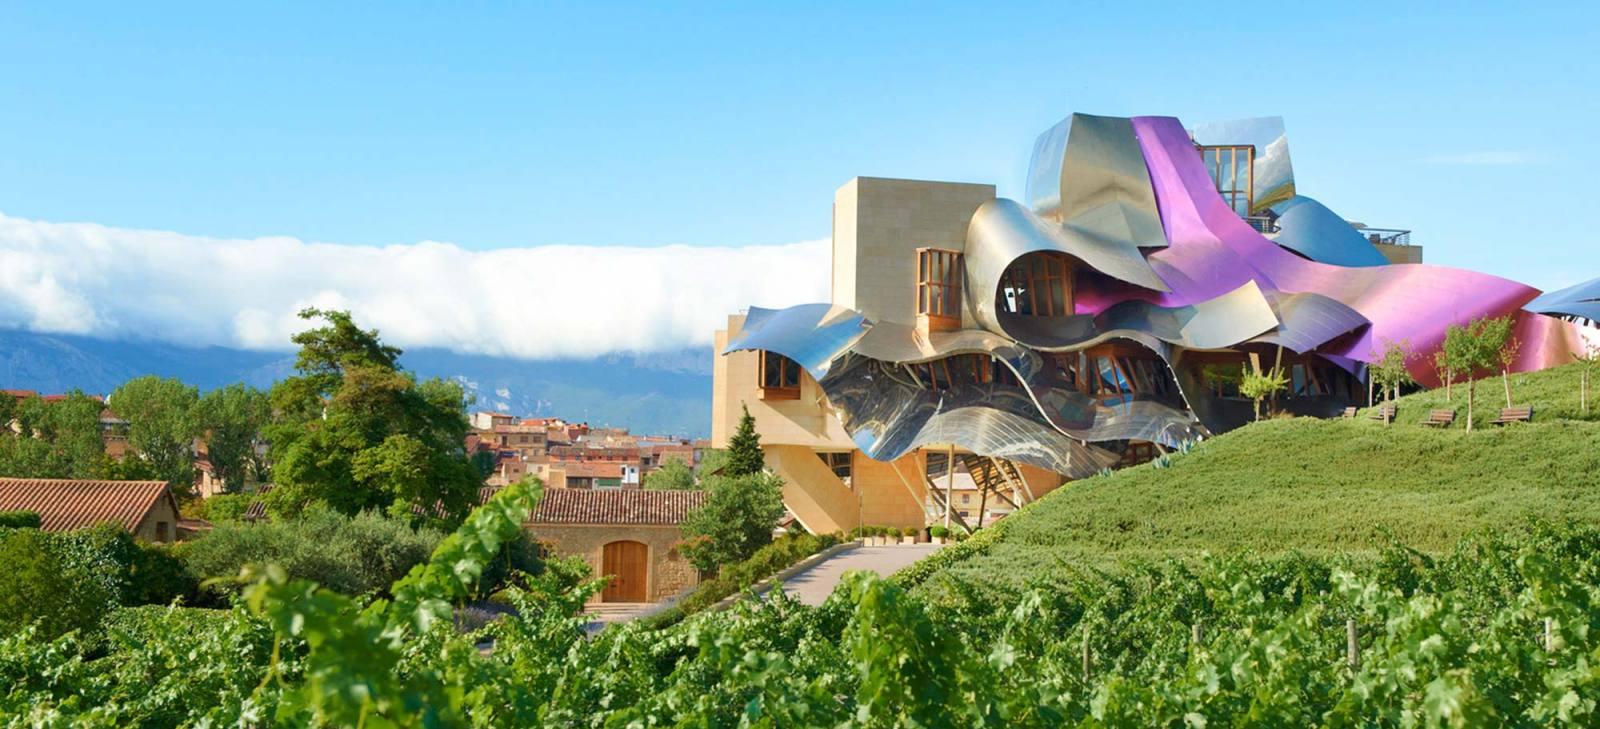 Hotel Marques de Riscal – Rioja Hotel Spain